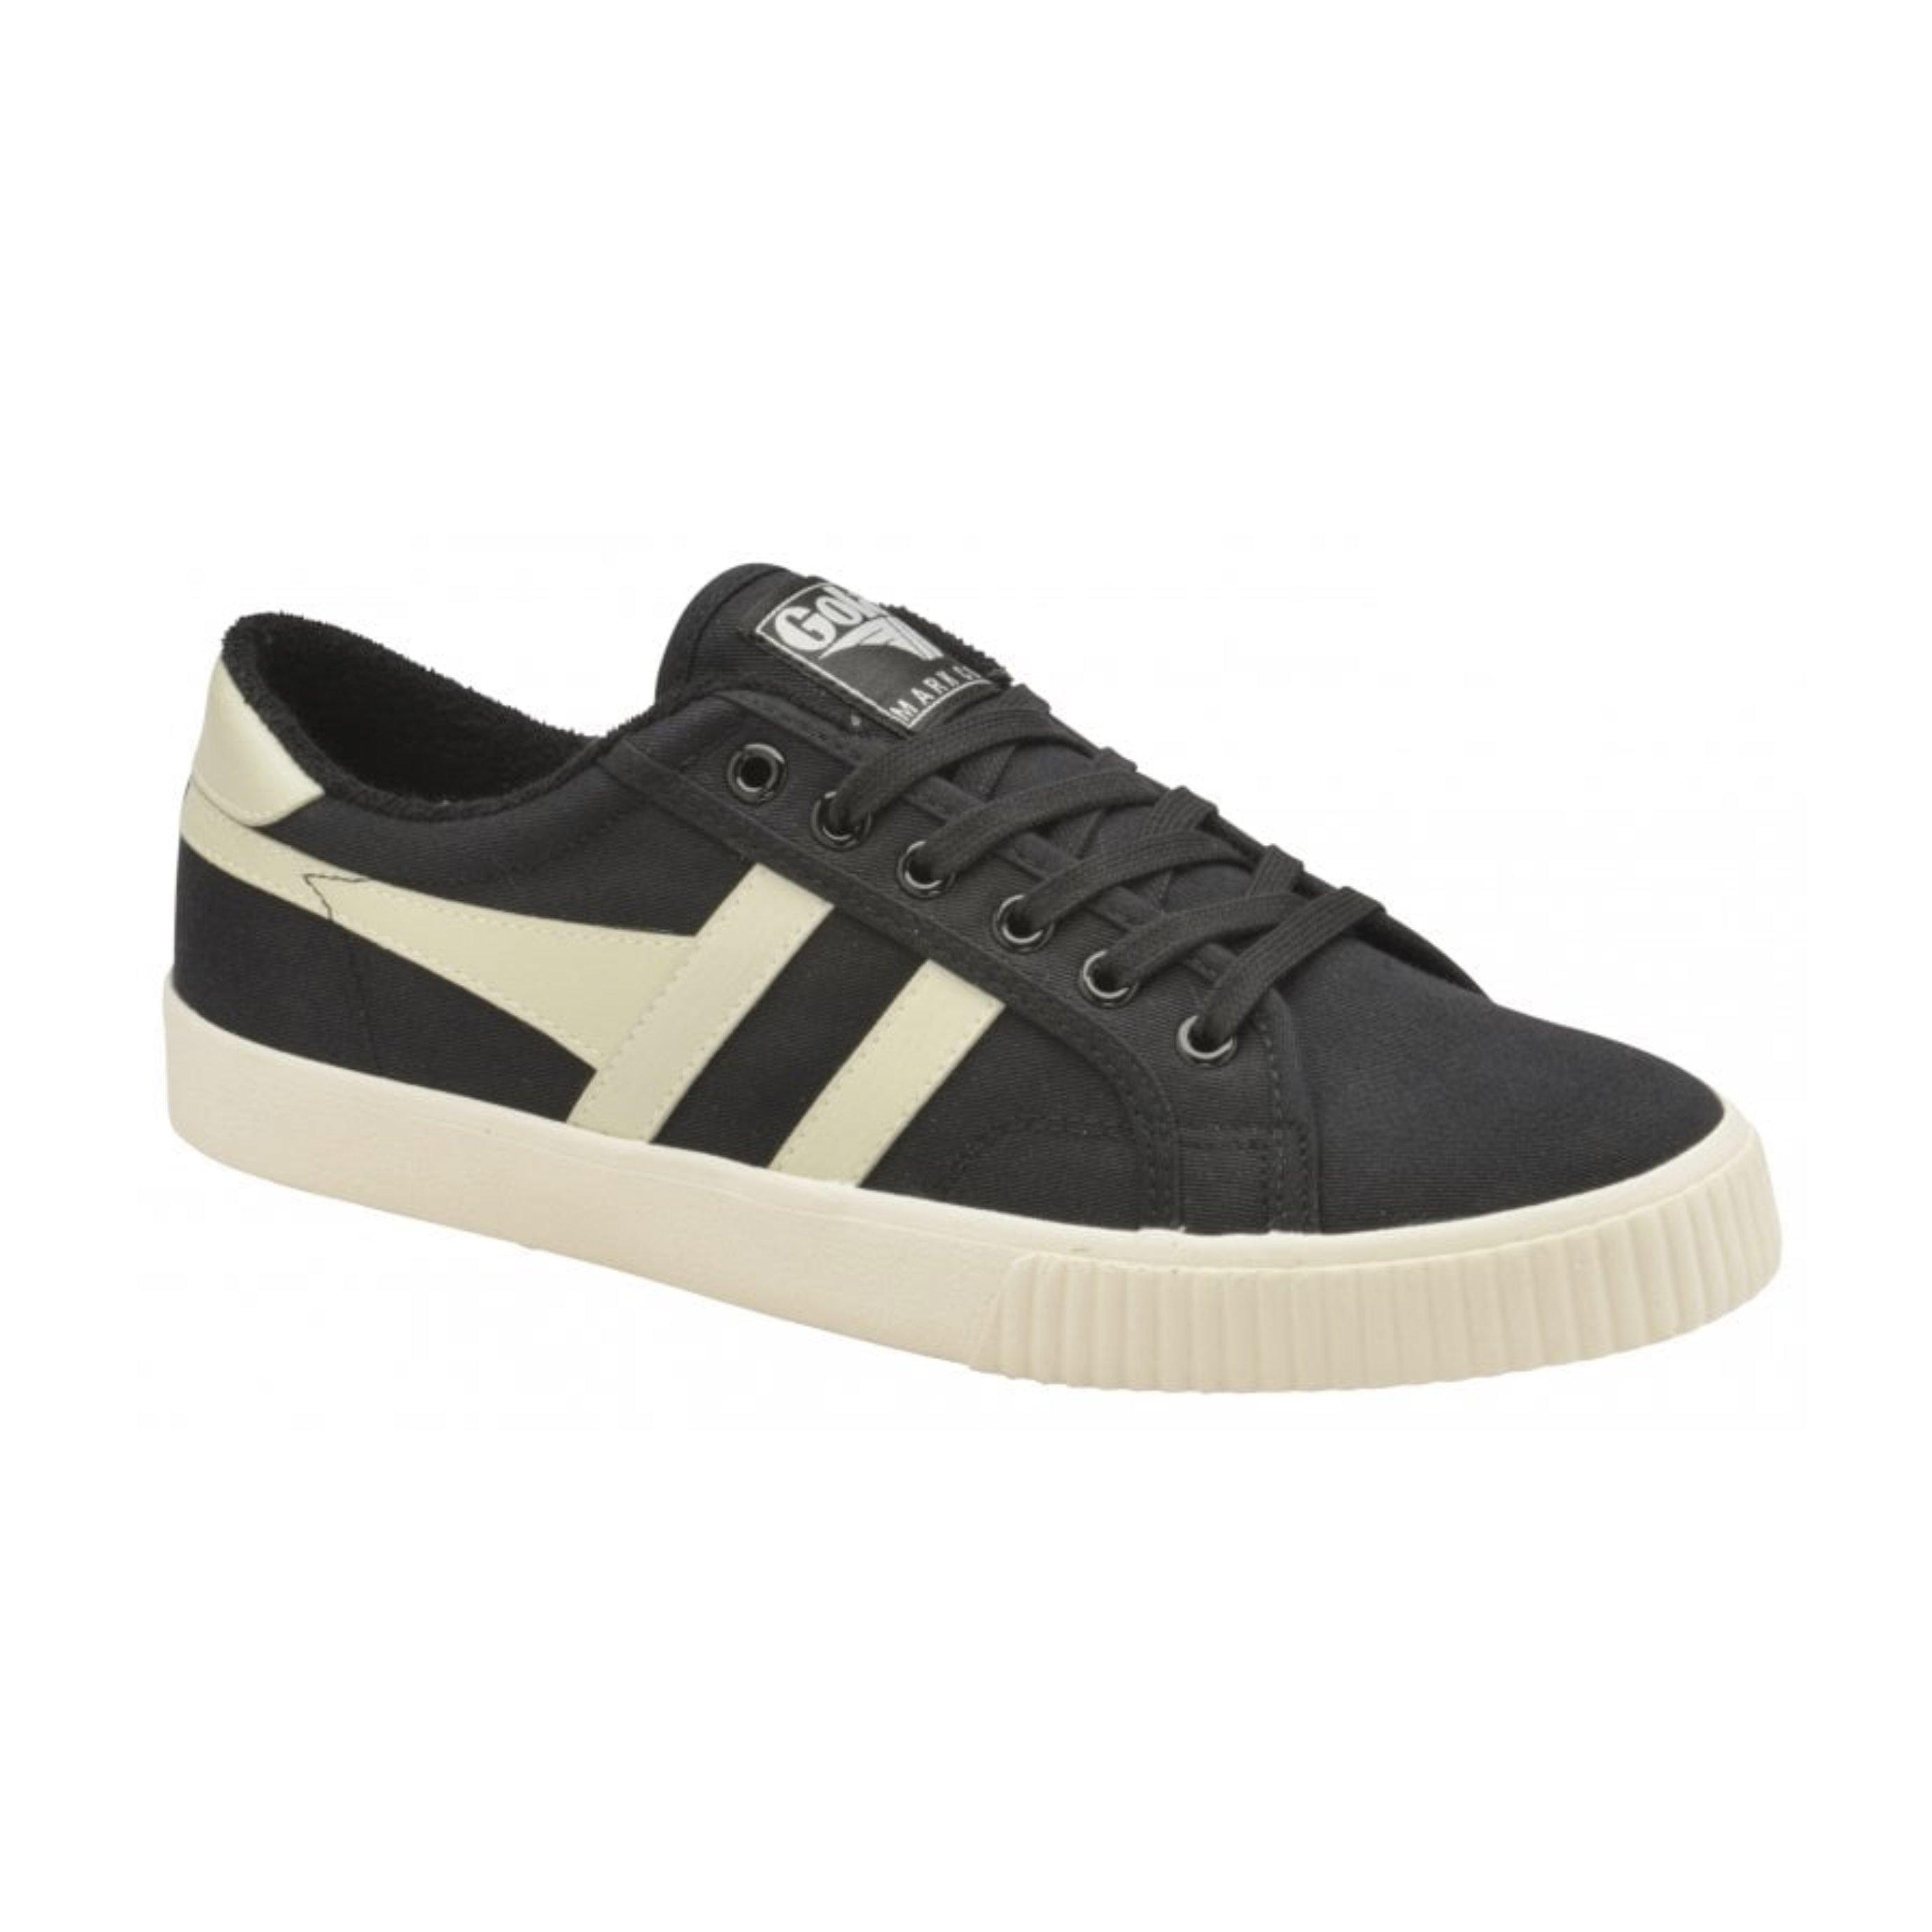 Tennis Mark Cox Cma280 - נעלי סניקרס טניס טרנדיות בצבע שחור